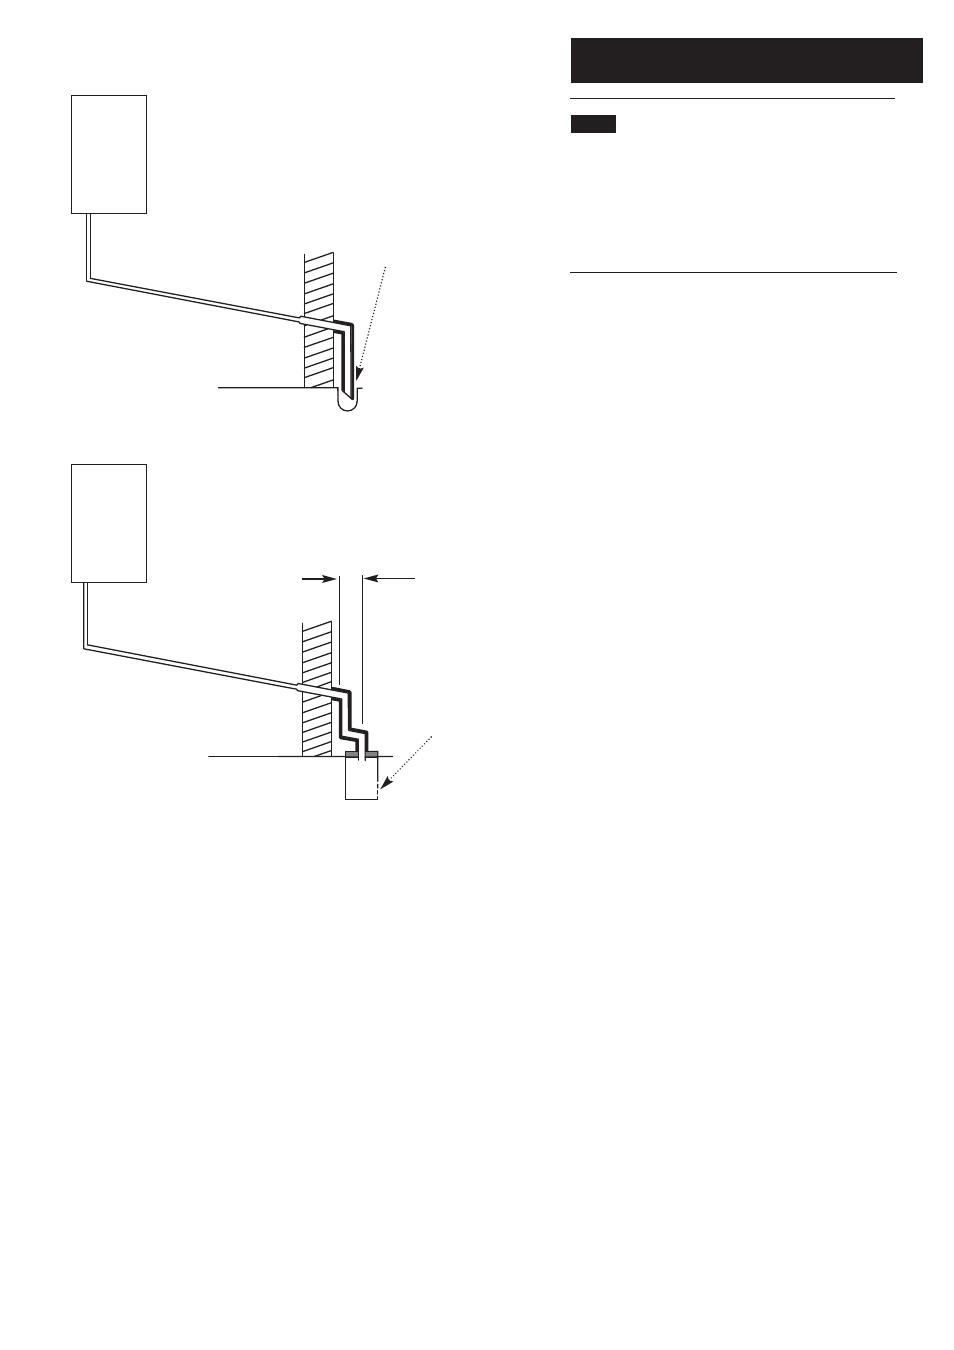 0 site requirements baxi potterton heatmax combi he condensing 0 site requirements baxi potterton heatmax combi he condensing combination boiler user manual page asfbconference2016 Choice Image